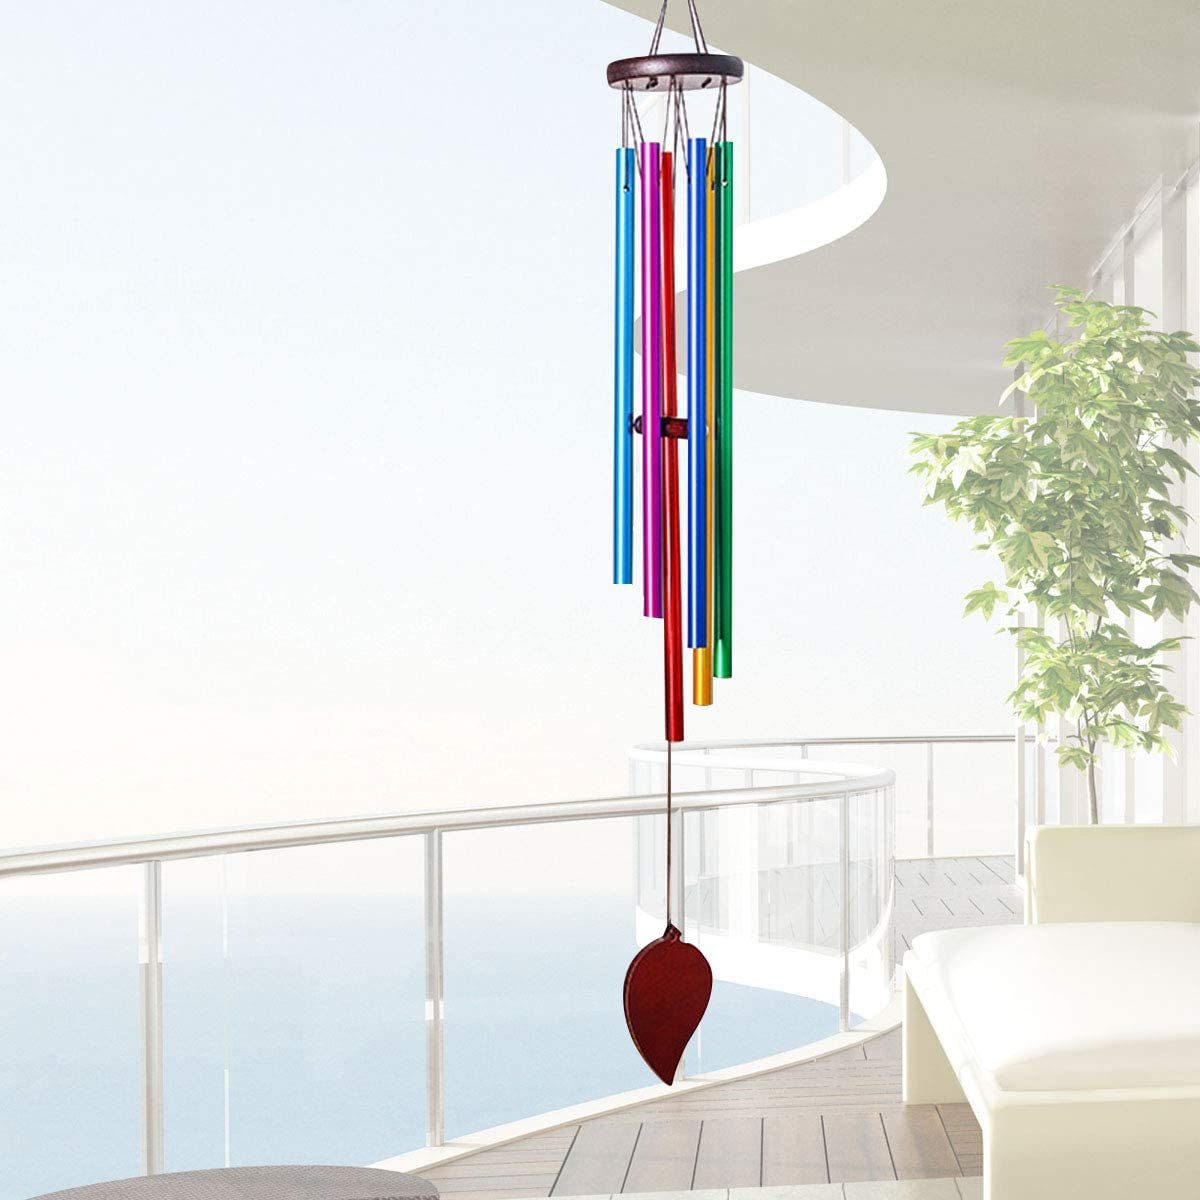 Haokaini Wind Chimes Outdoor Garden Windchime 6 Metal Tubes Large Musical Windchime for Indoor Outdoor Patio Balcony Yard Terrace Decor